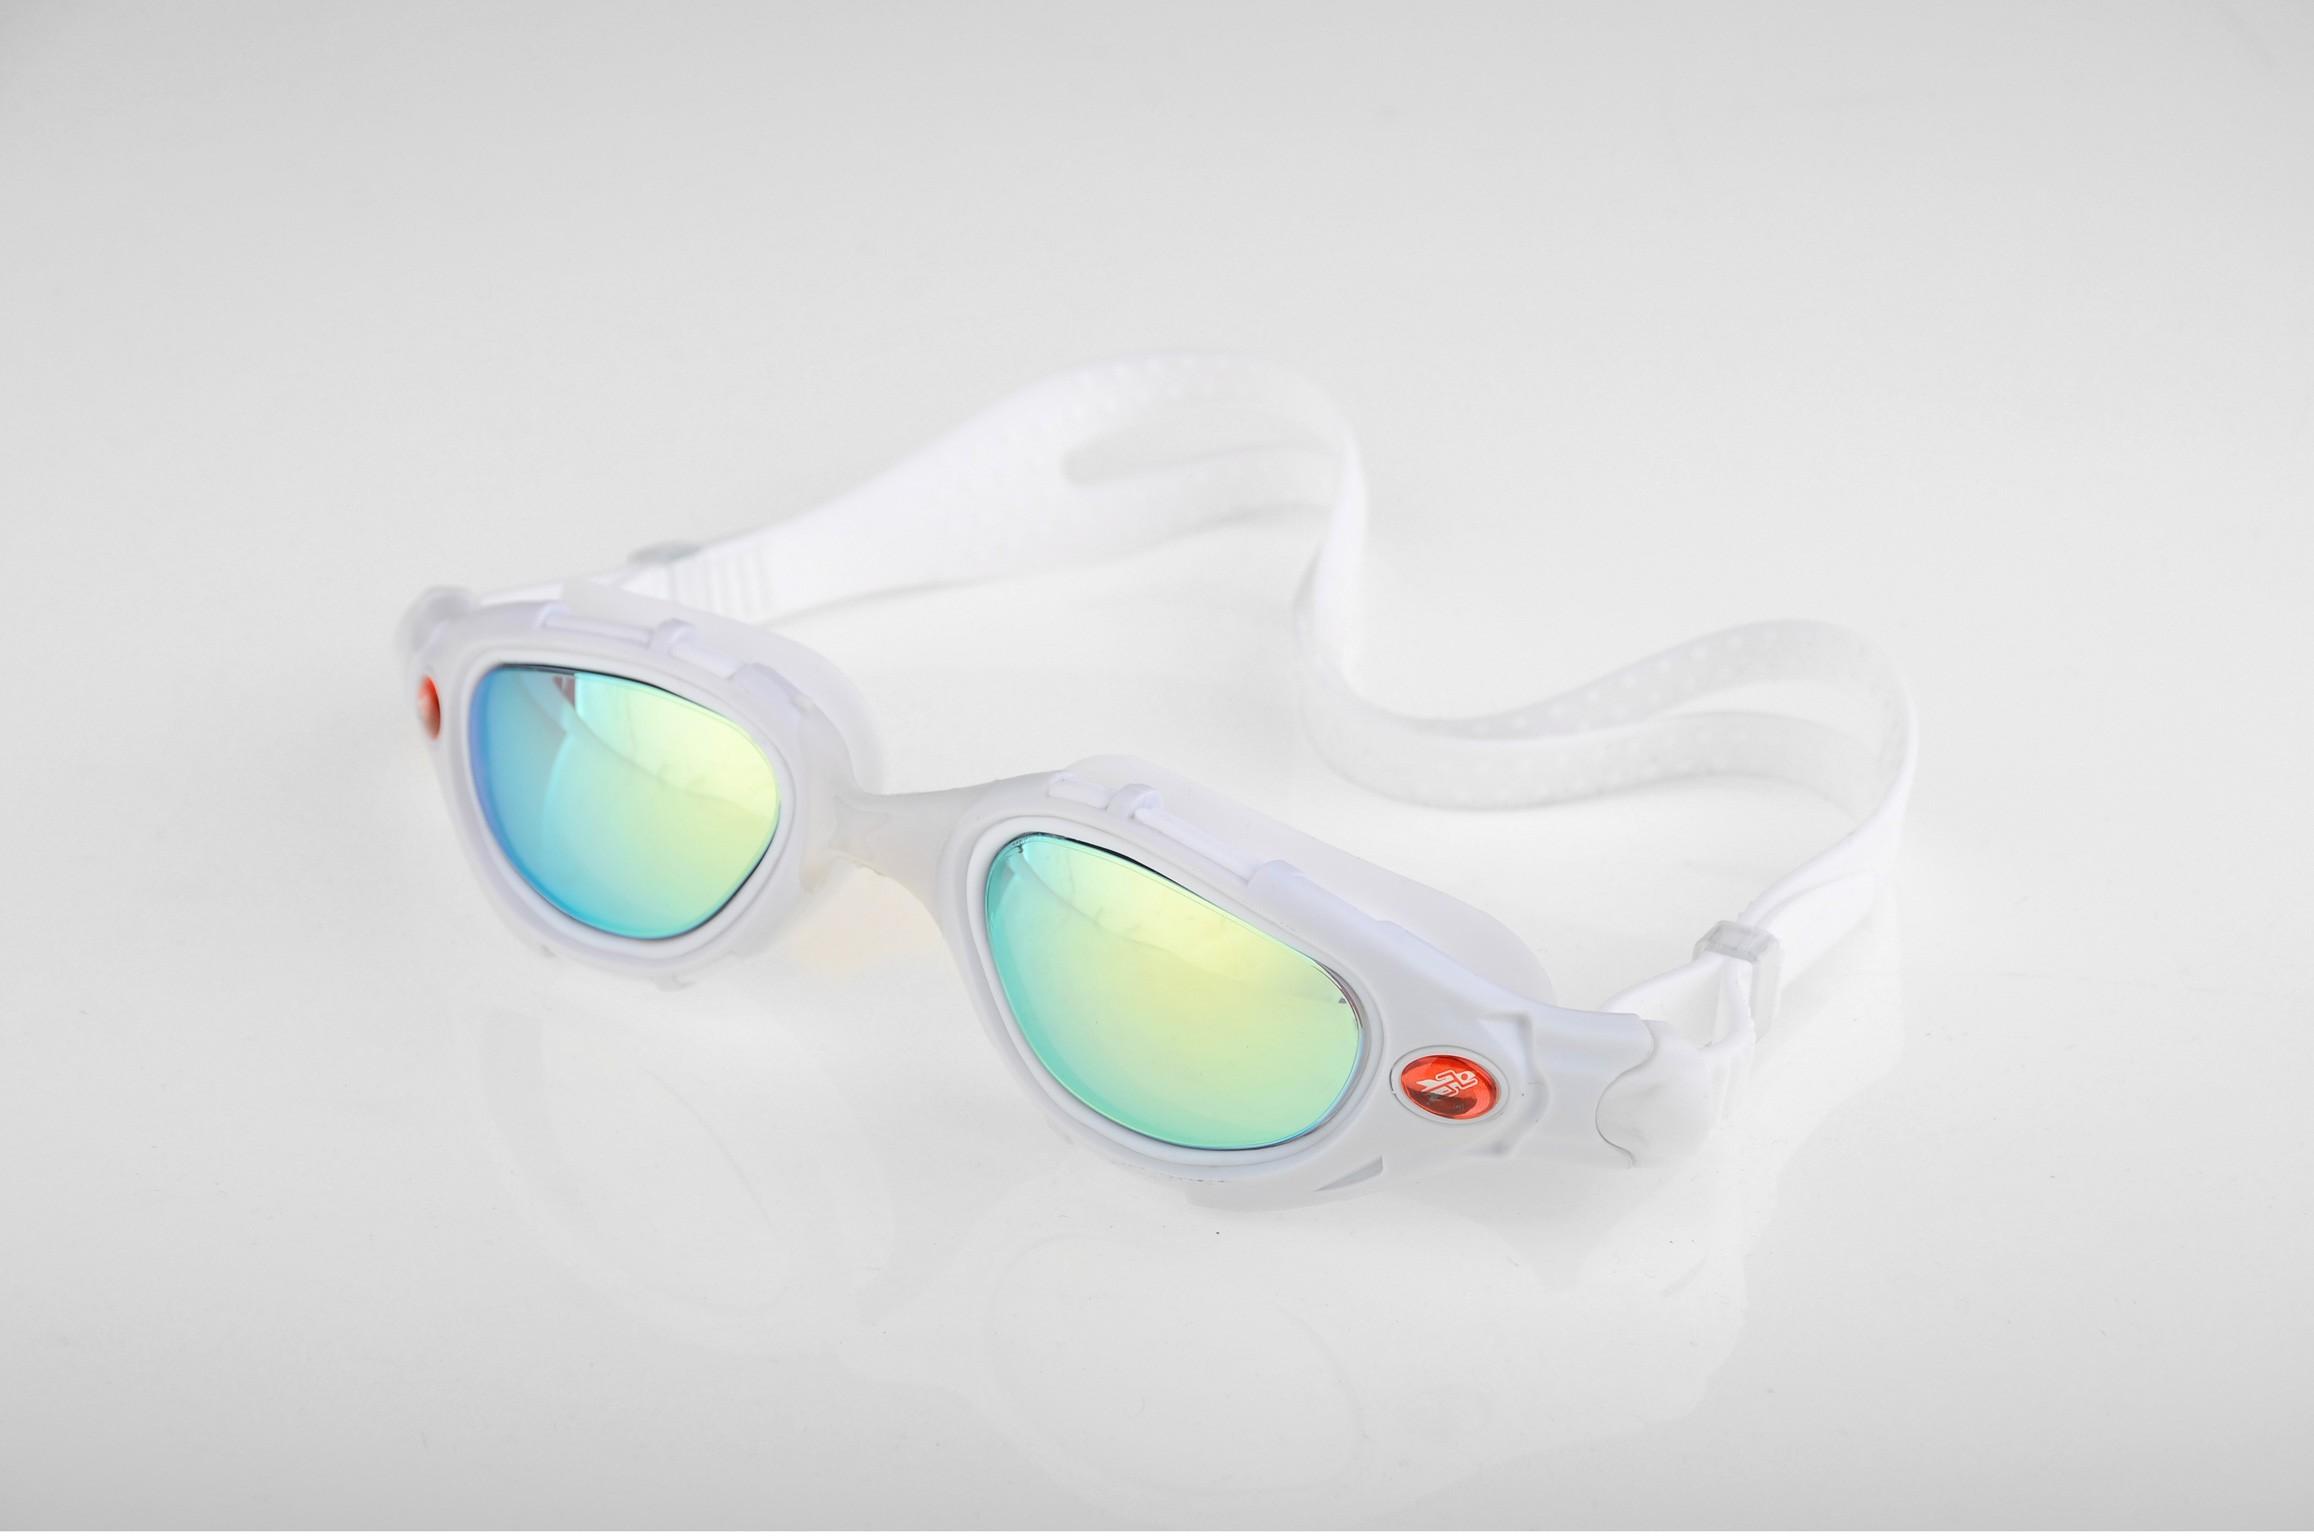 2a002a8bab Rocket Science Sports Sputnik Swim Goggles - RM209.00 - Bicycle ...